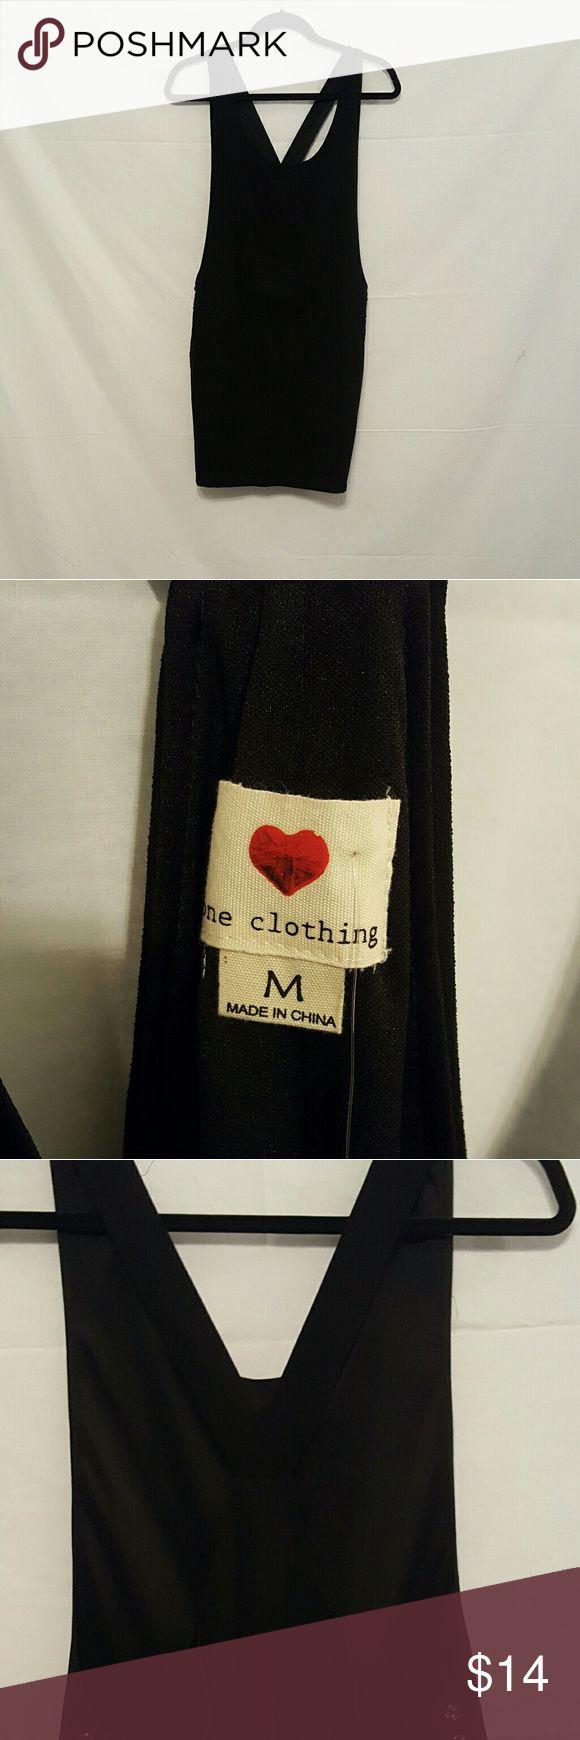 One Clothing Jumper Dress BNWT Size medium  Brand New With Tags  One clothing black jumper dress one clothing Dresses